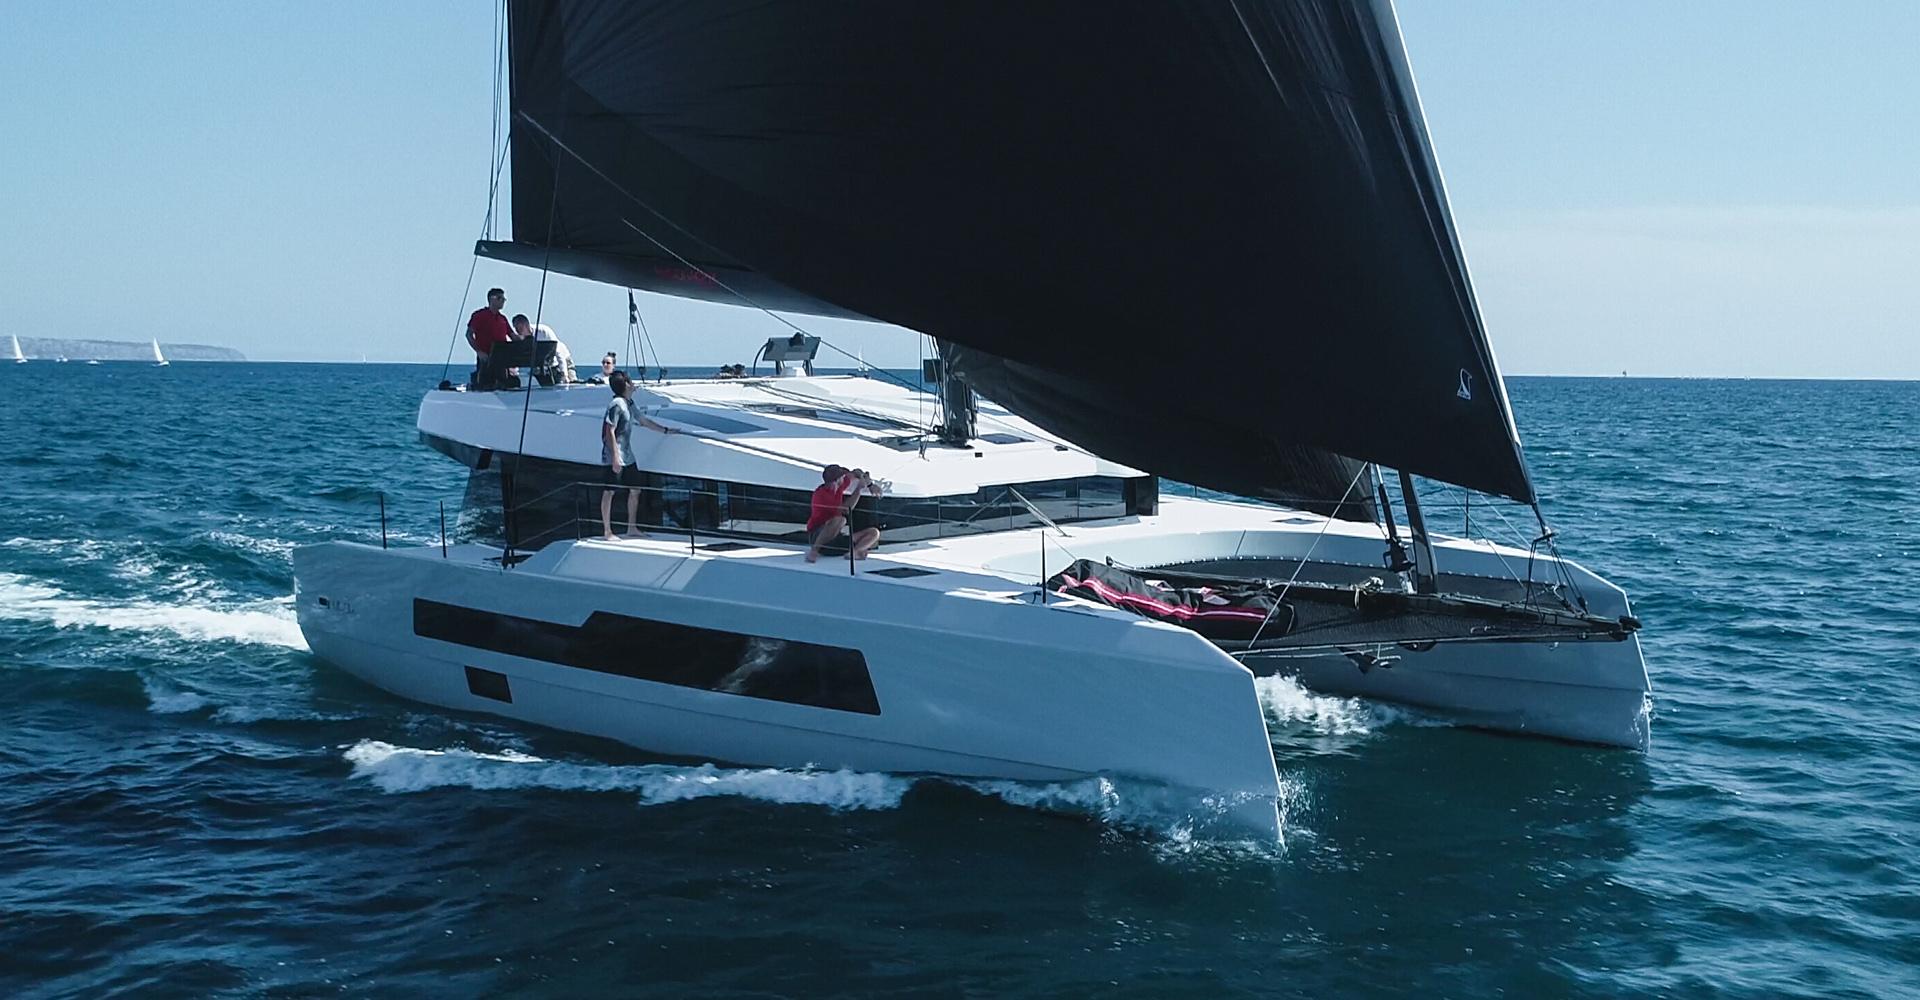 The MC50 multihull by McConaghy sailing along